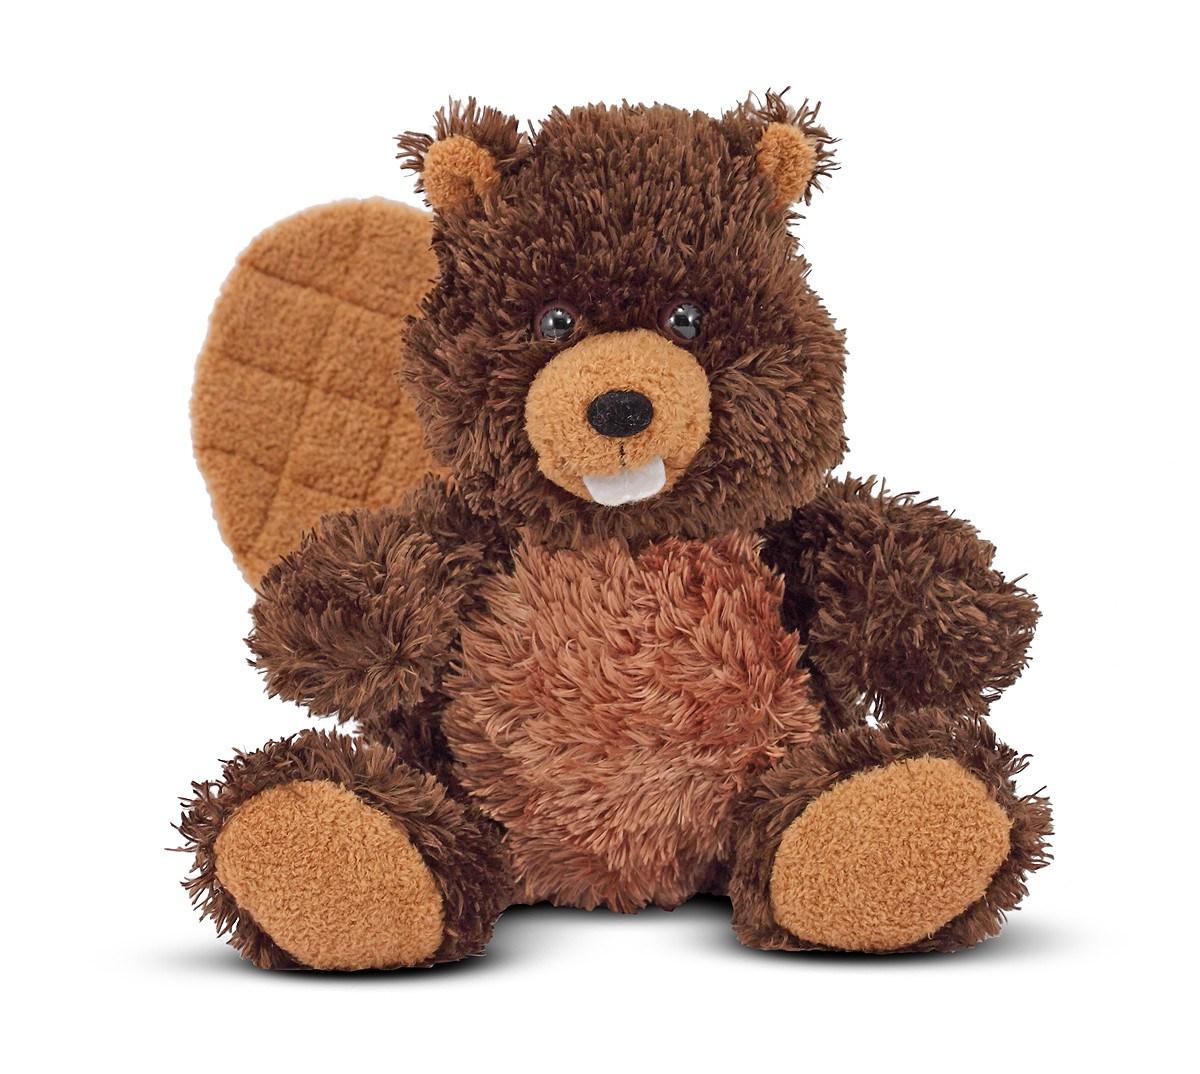 Мягкая игрушка - БоберДикие животные<br>Мягкая игрушка - Бобер<br>